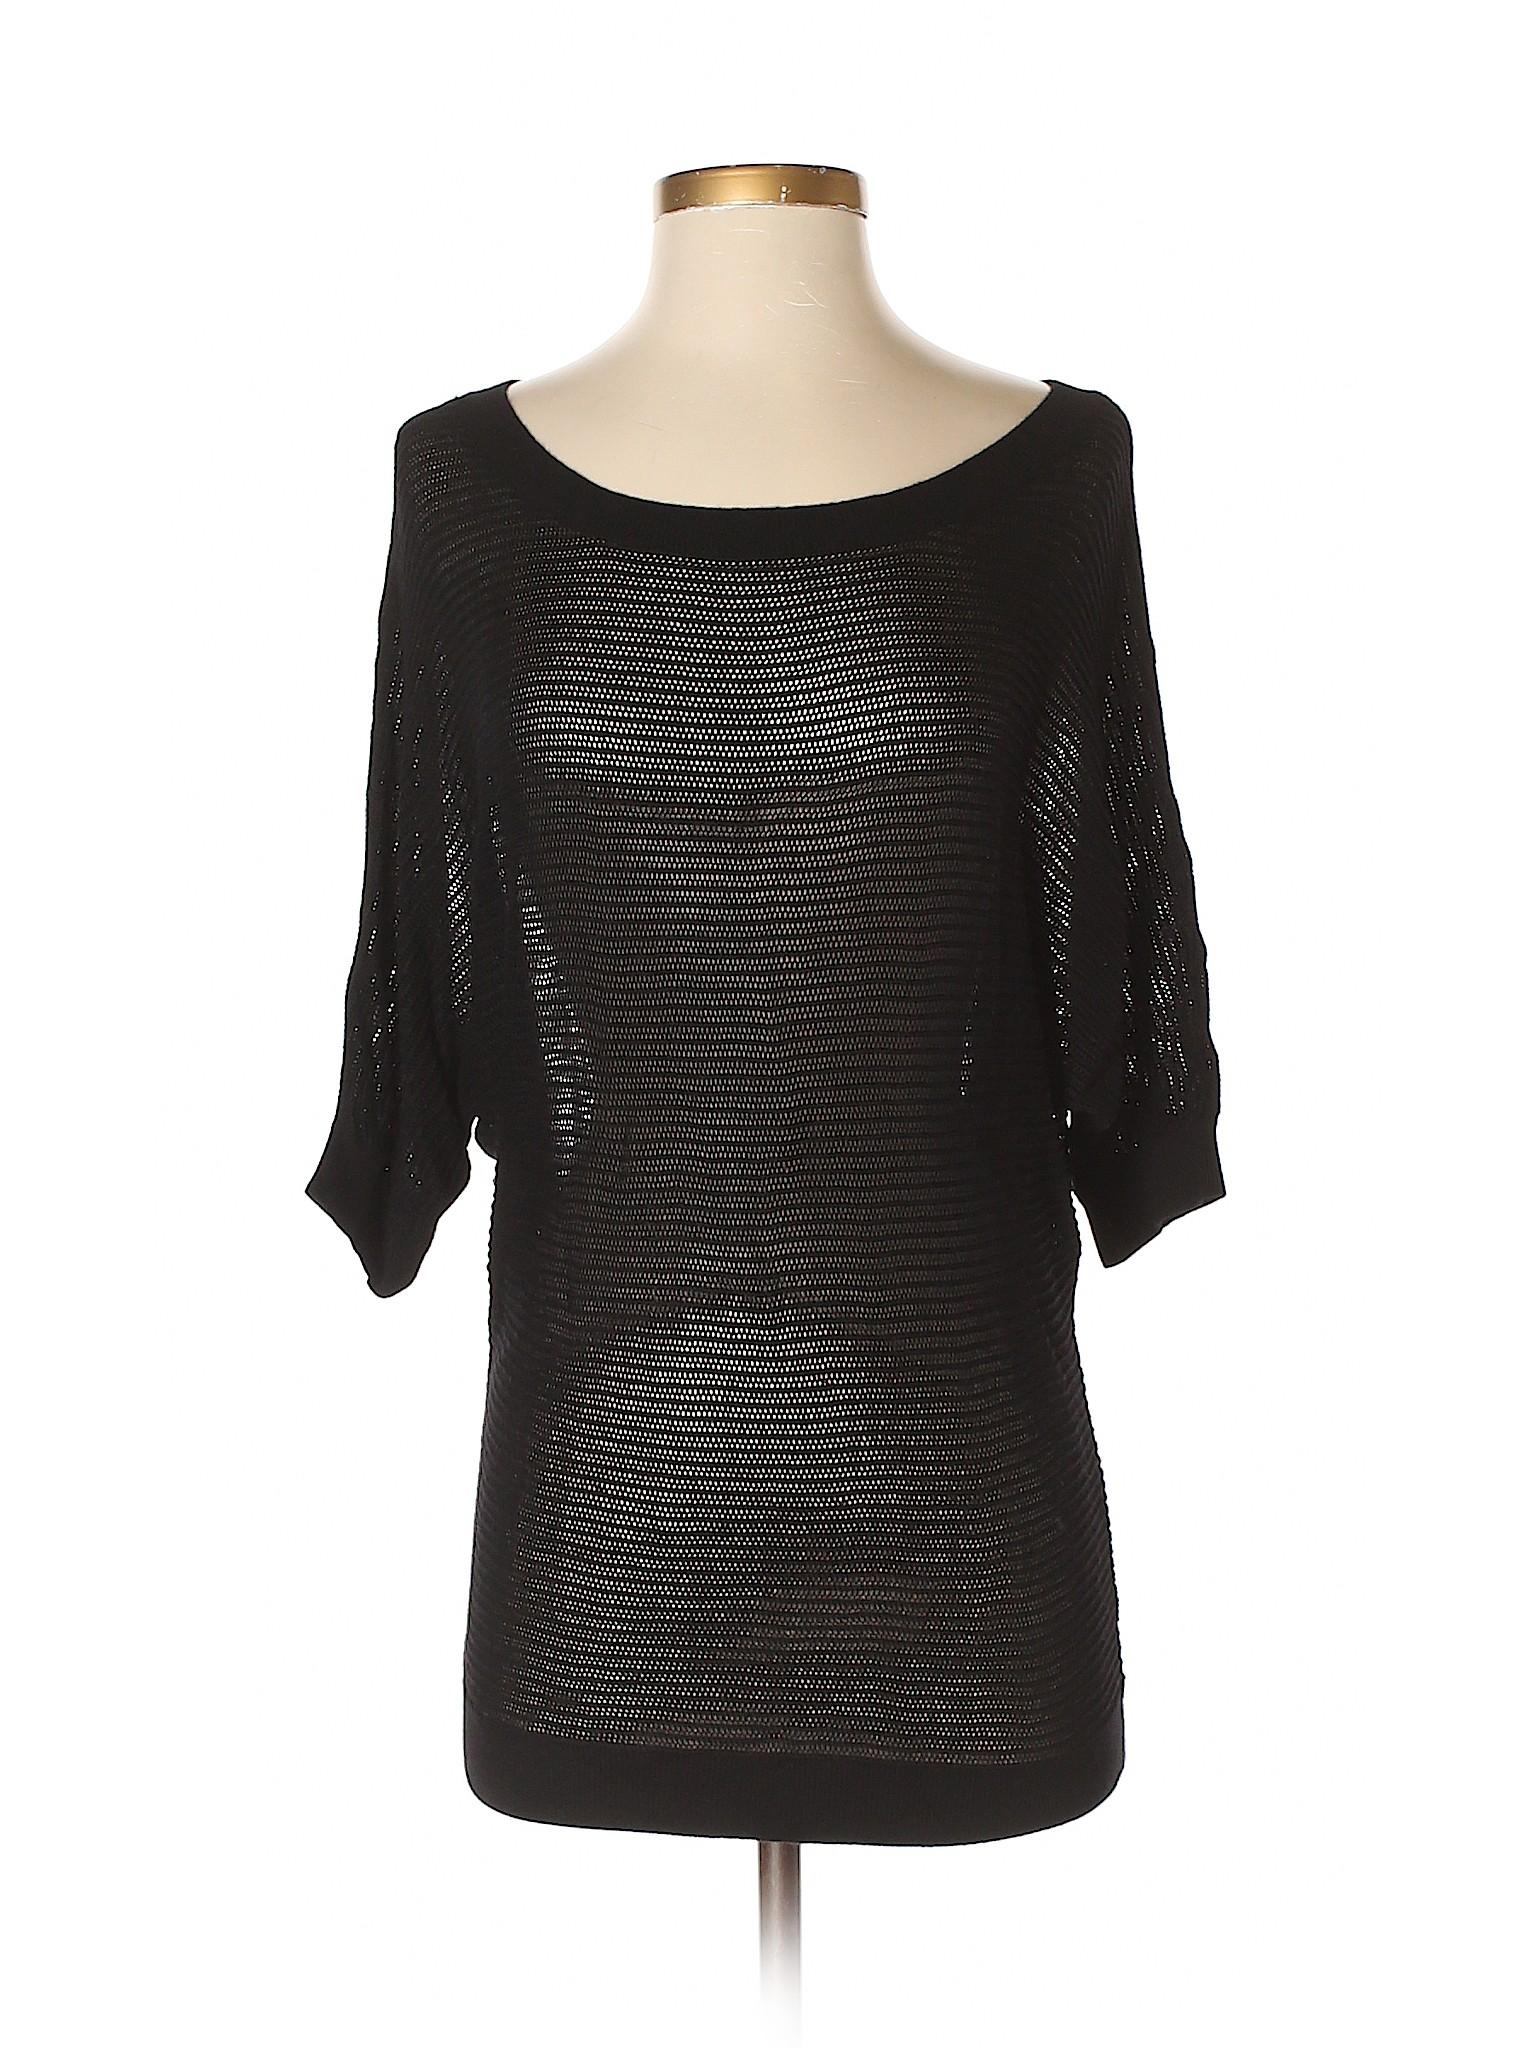 Express Boutique Boutique winter Pullover Sweater winter aqt0Twq7